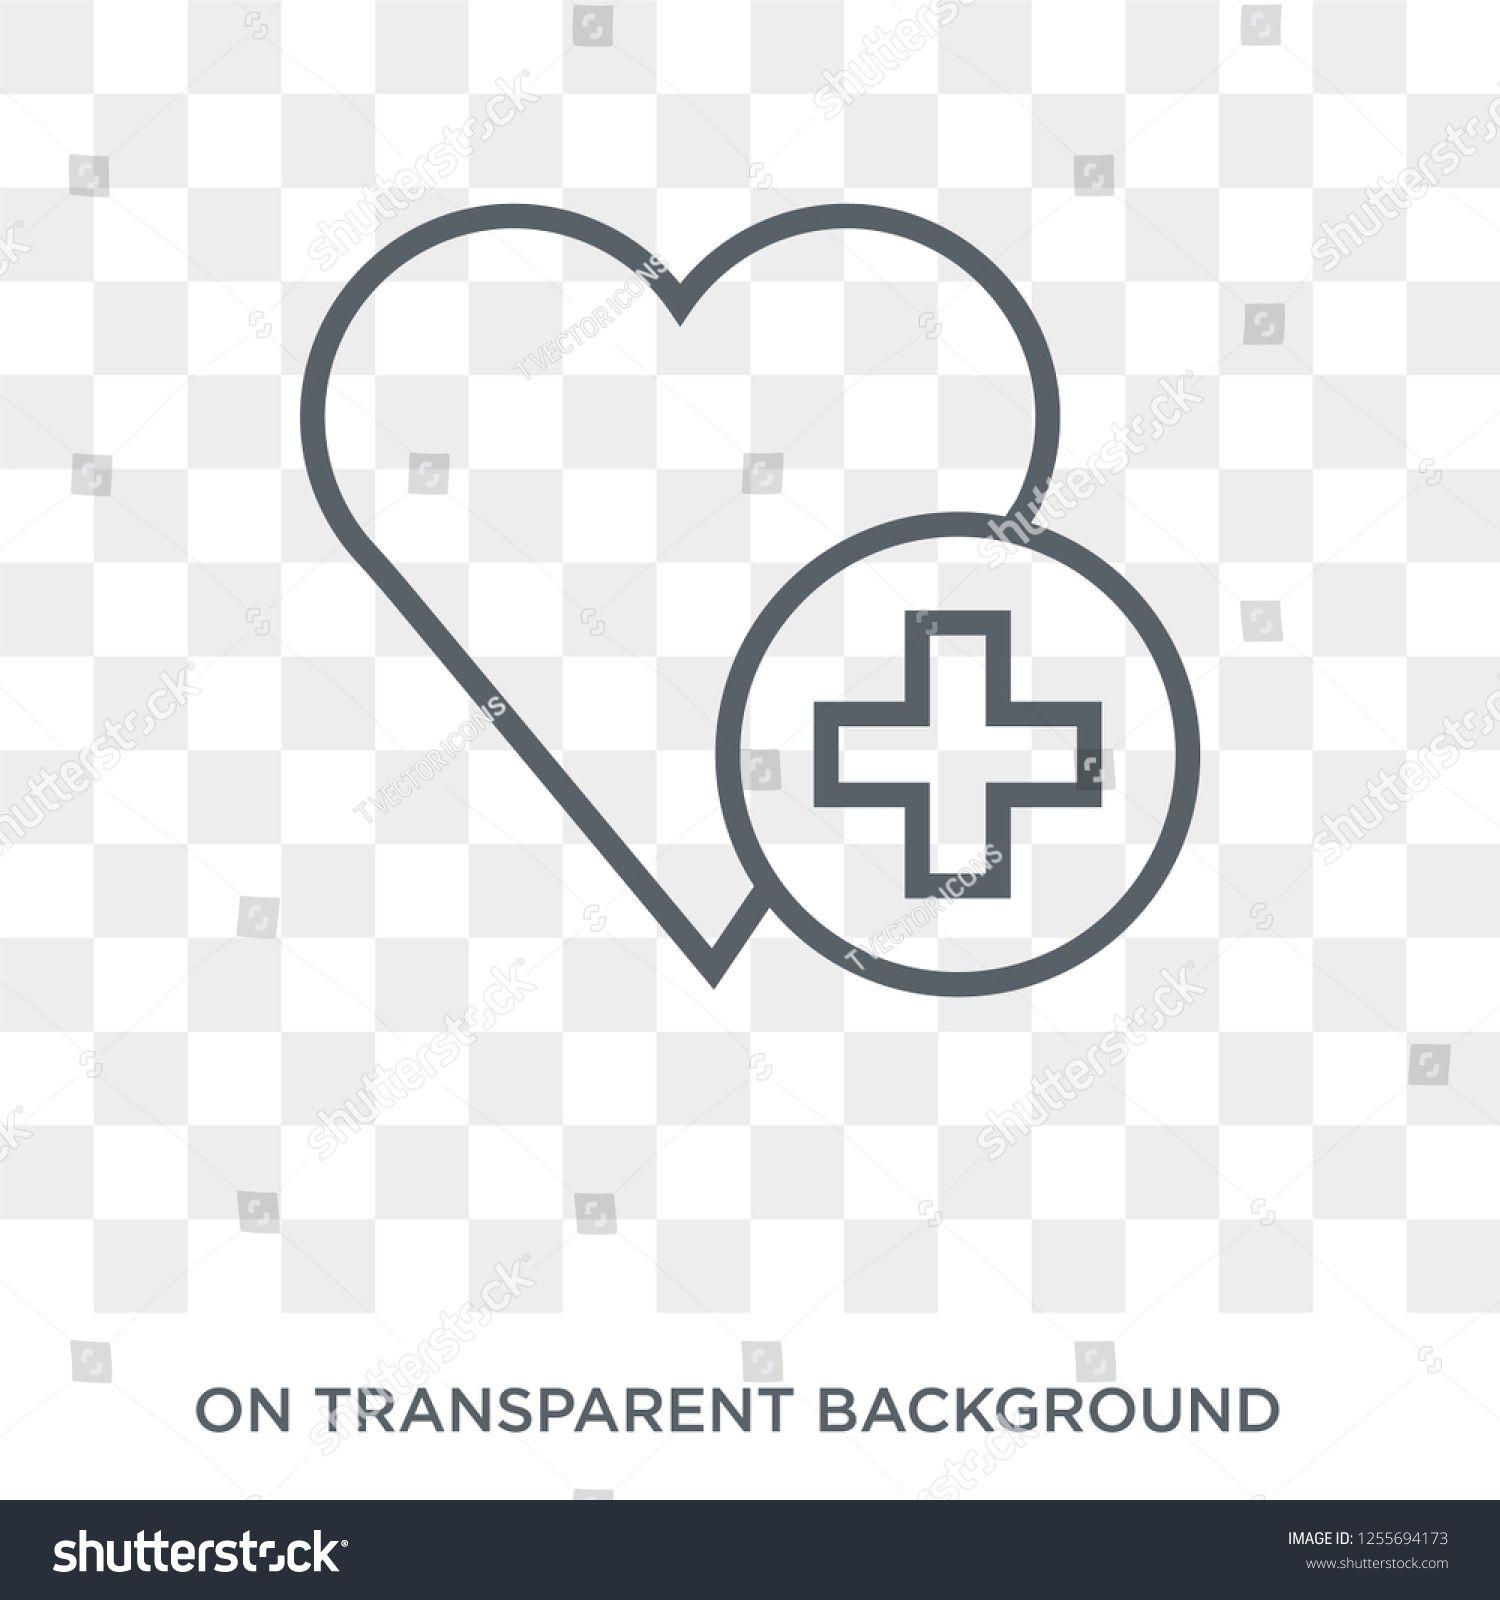 Healthcare icon. Trendy flat vector Healthcare icon on